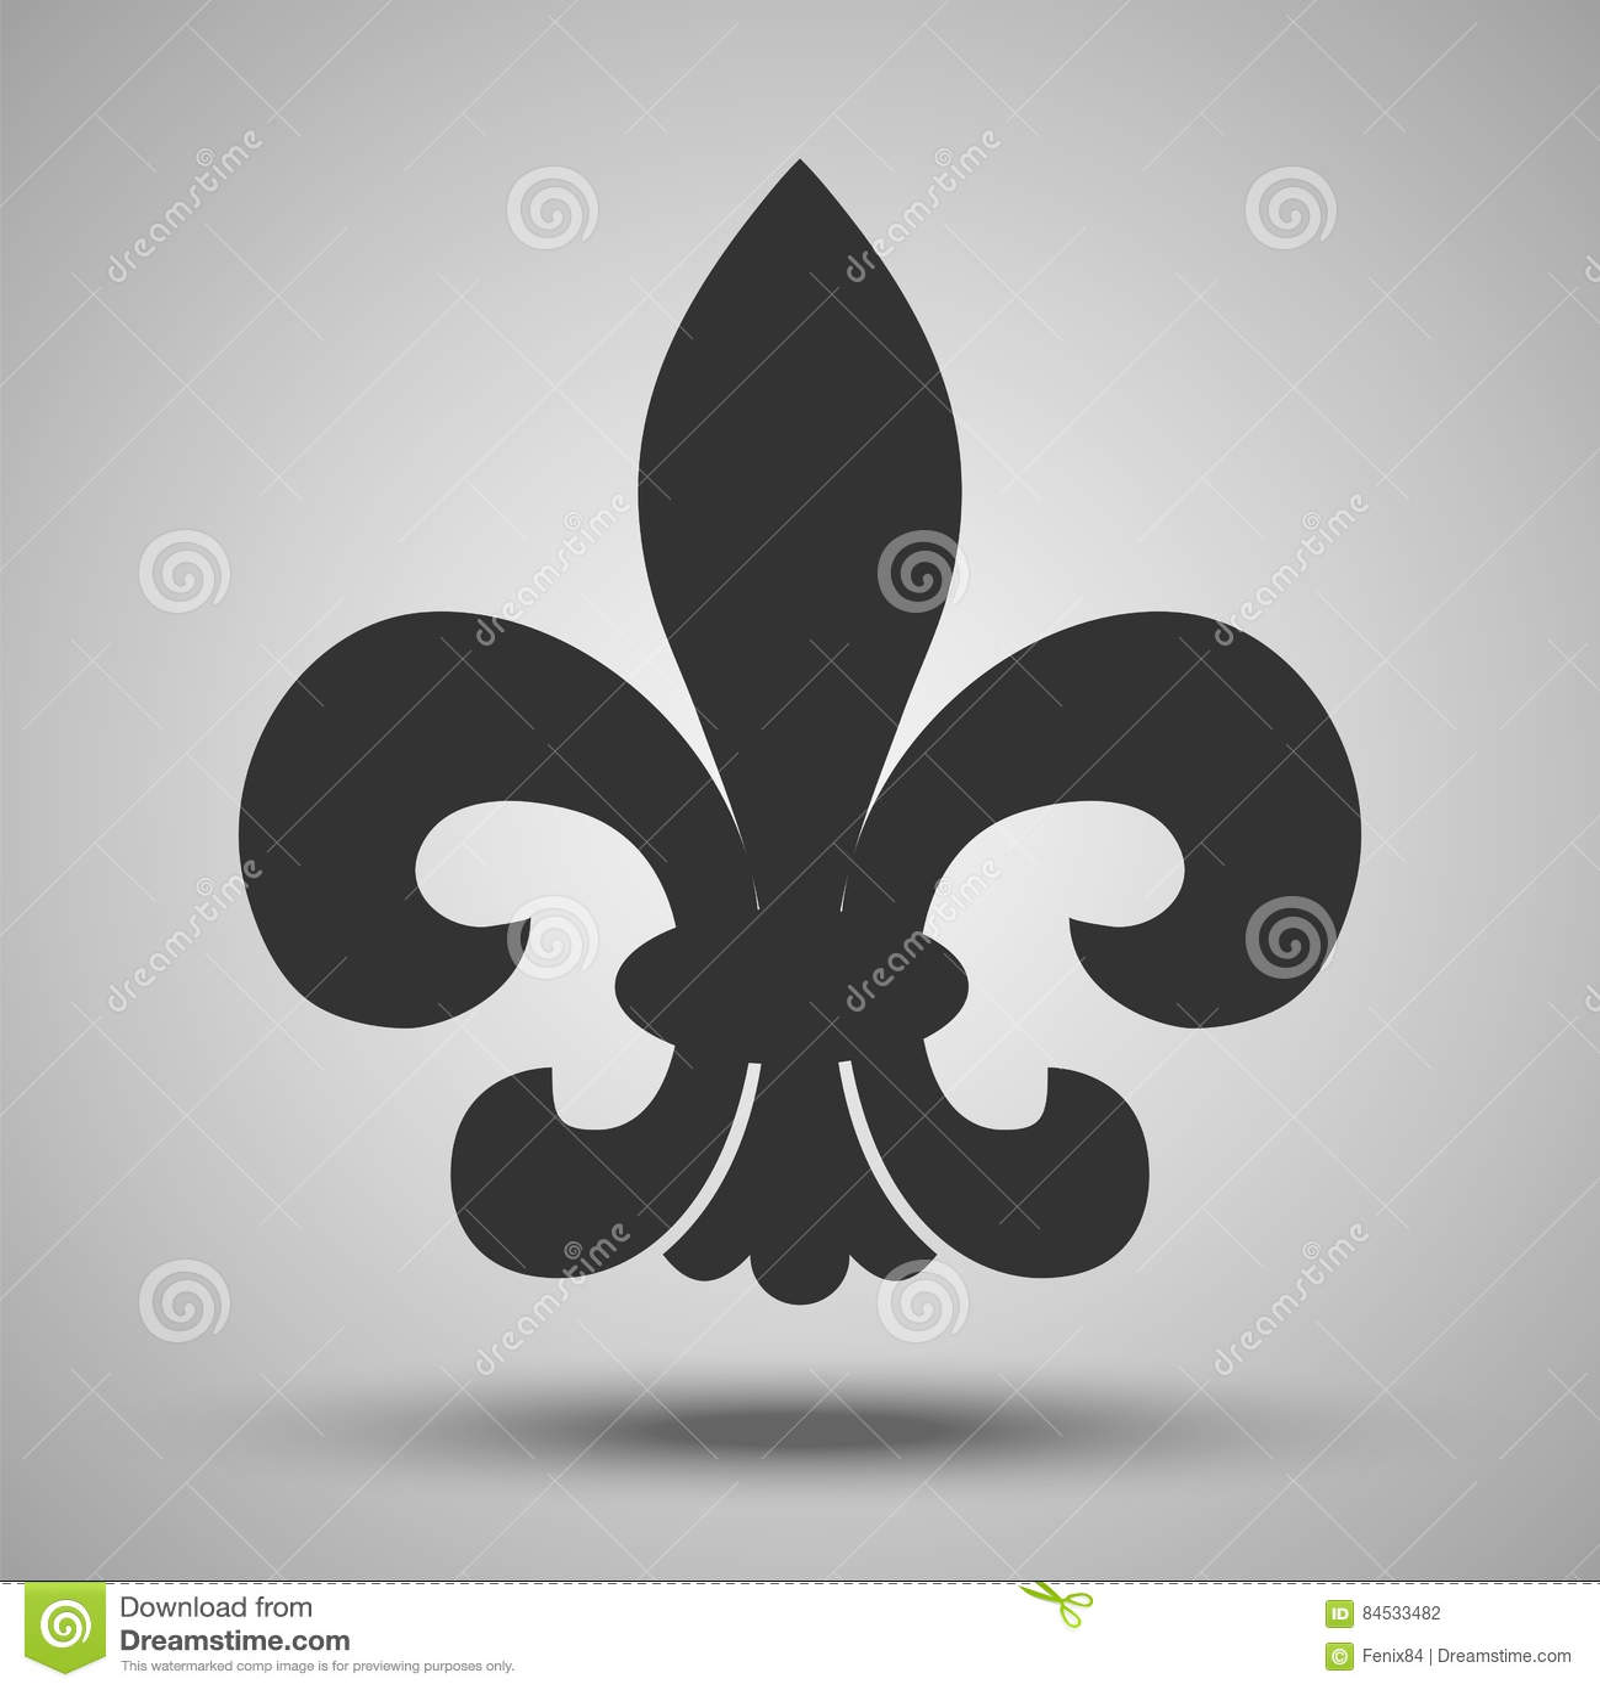 Fleur de lis french royal historical symbol vector illustrati french royal historical symbol vector illustrati biocorpaavc Gallery